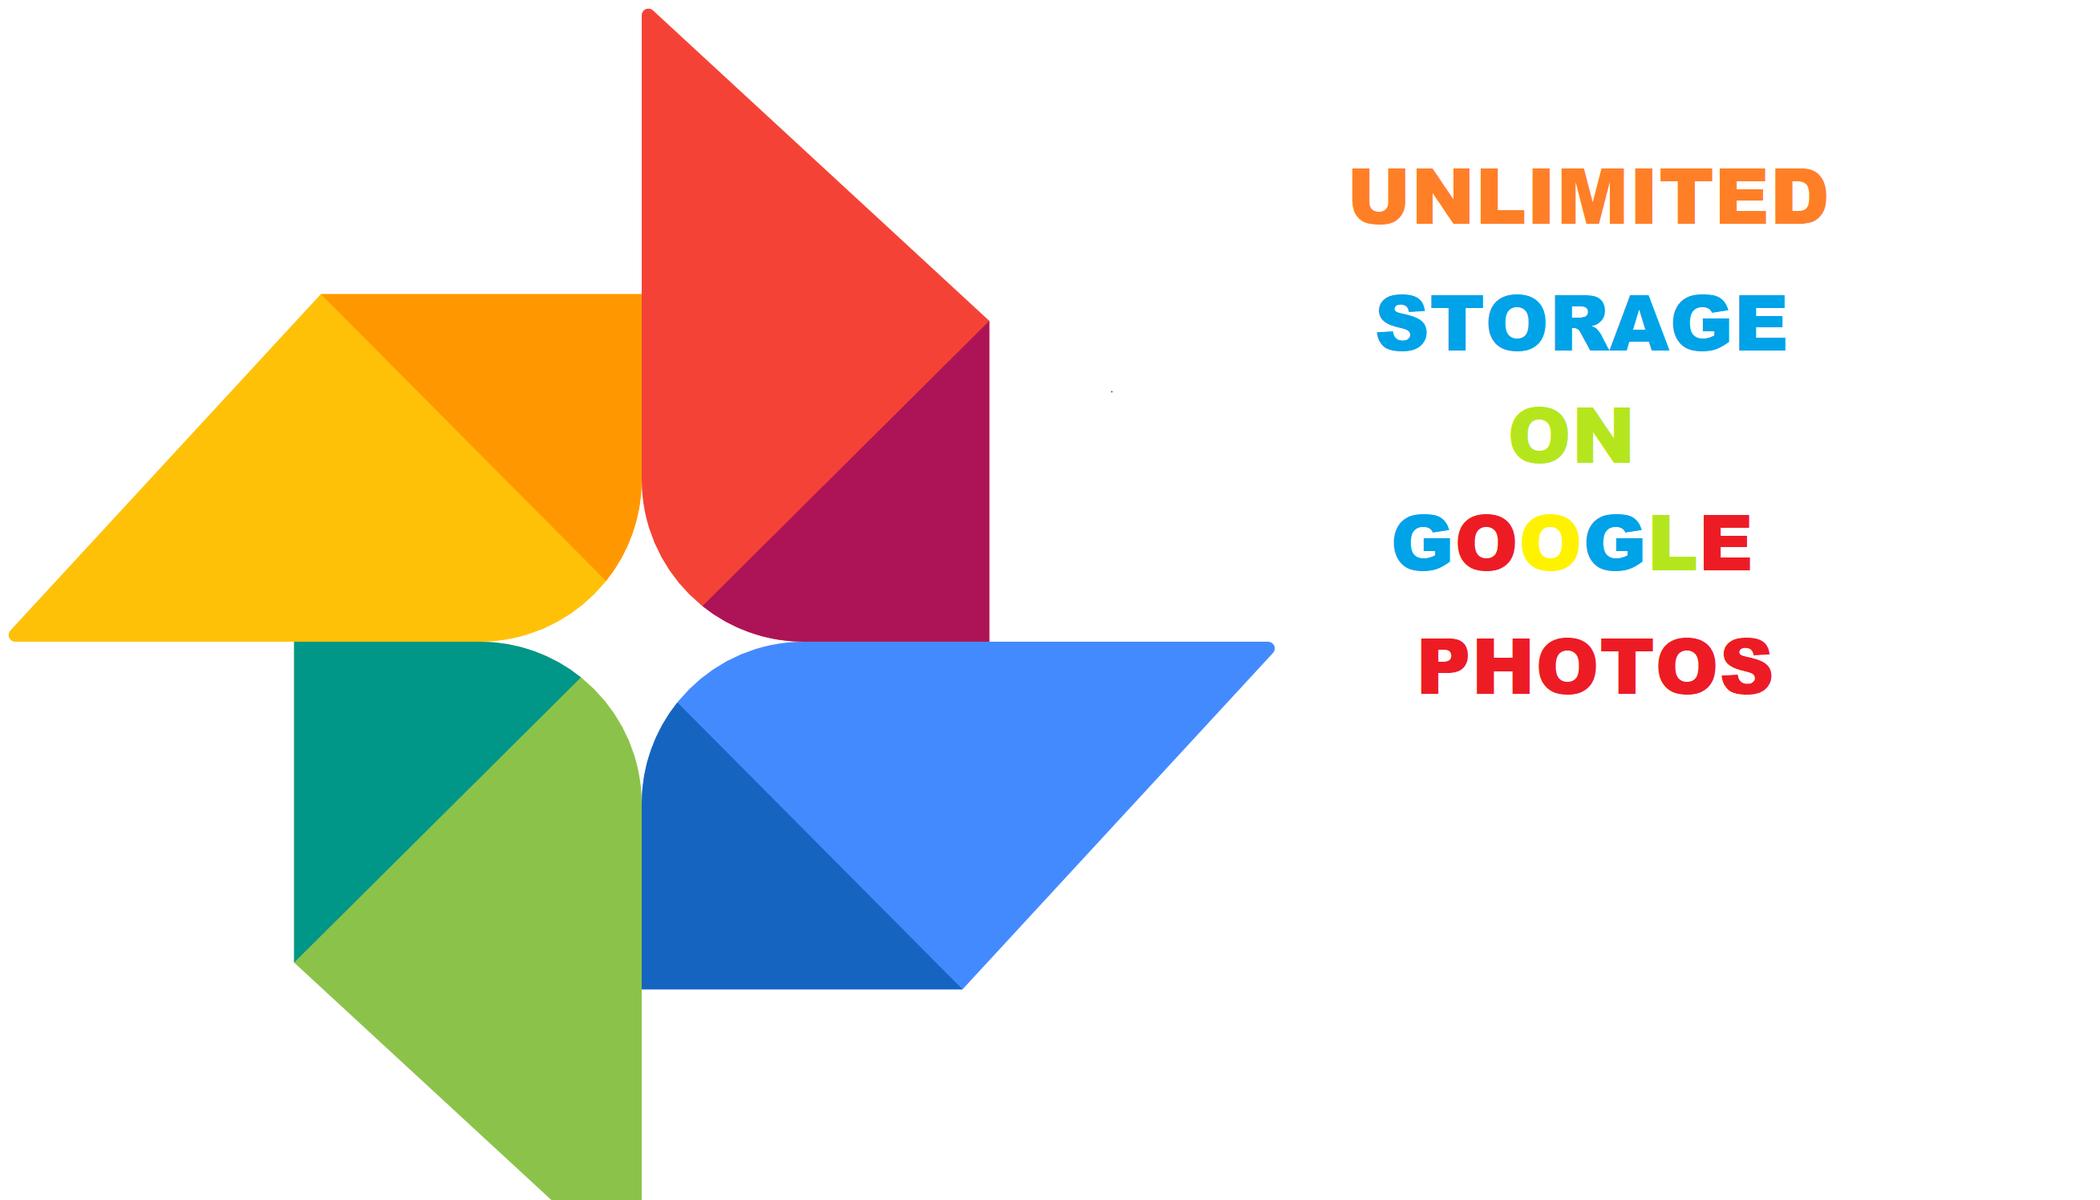 google photos unlimited storage